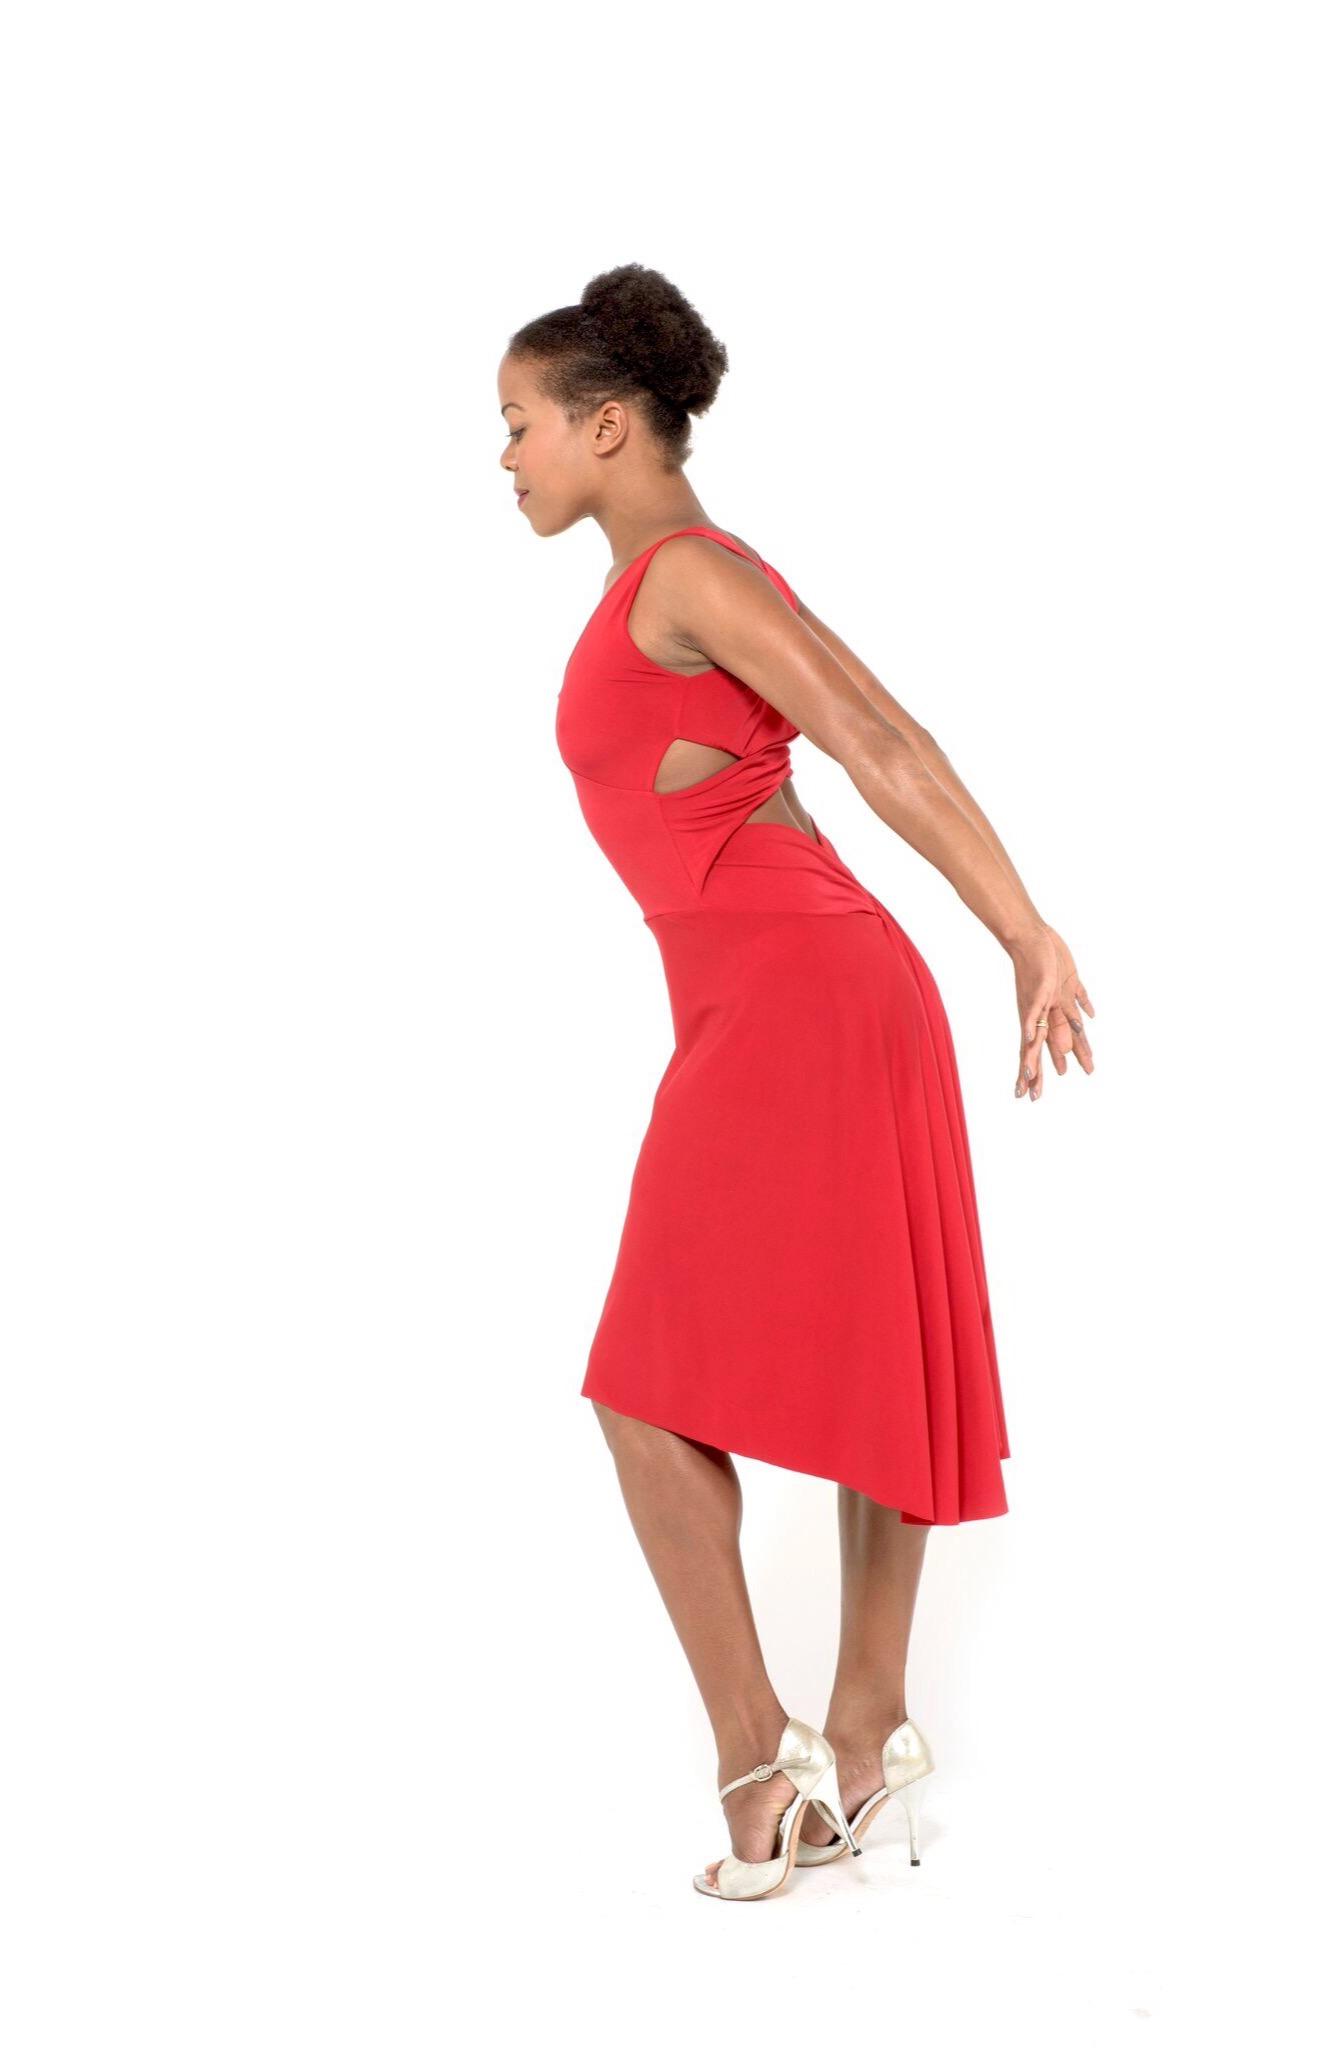 D1 Simple Amp Elegant Tango Dress The London Tango Boutique